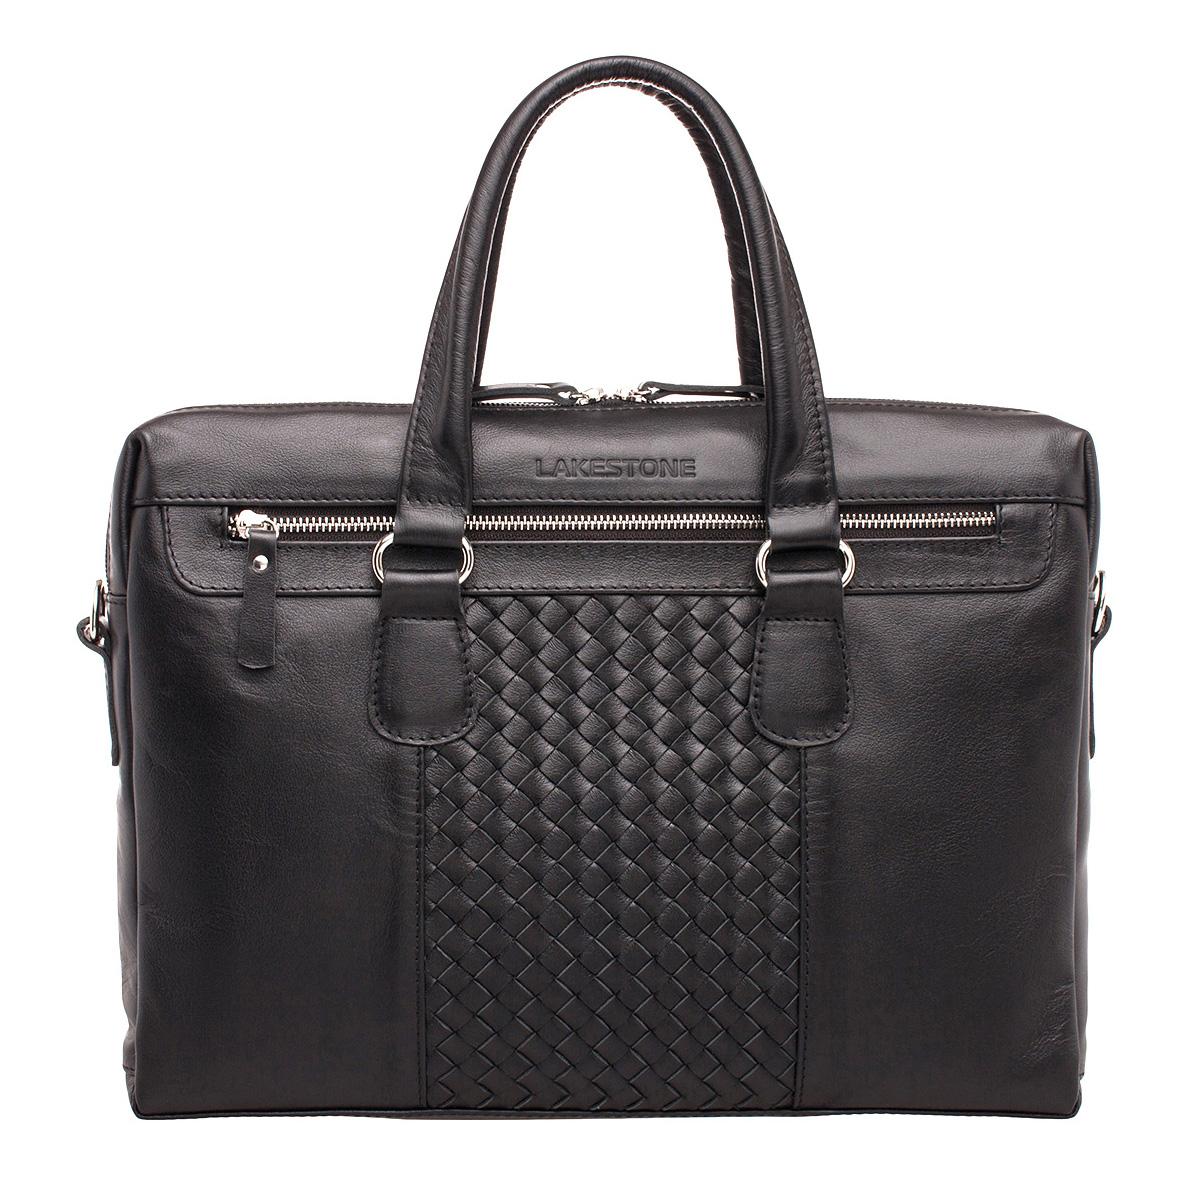 Деловая сумка Bramley Black для ноутбука фото